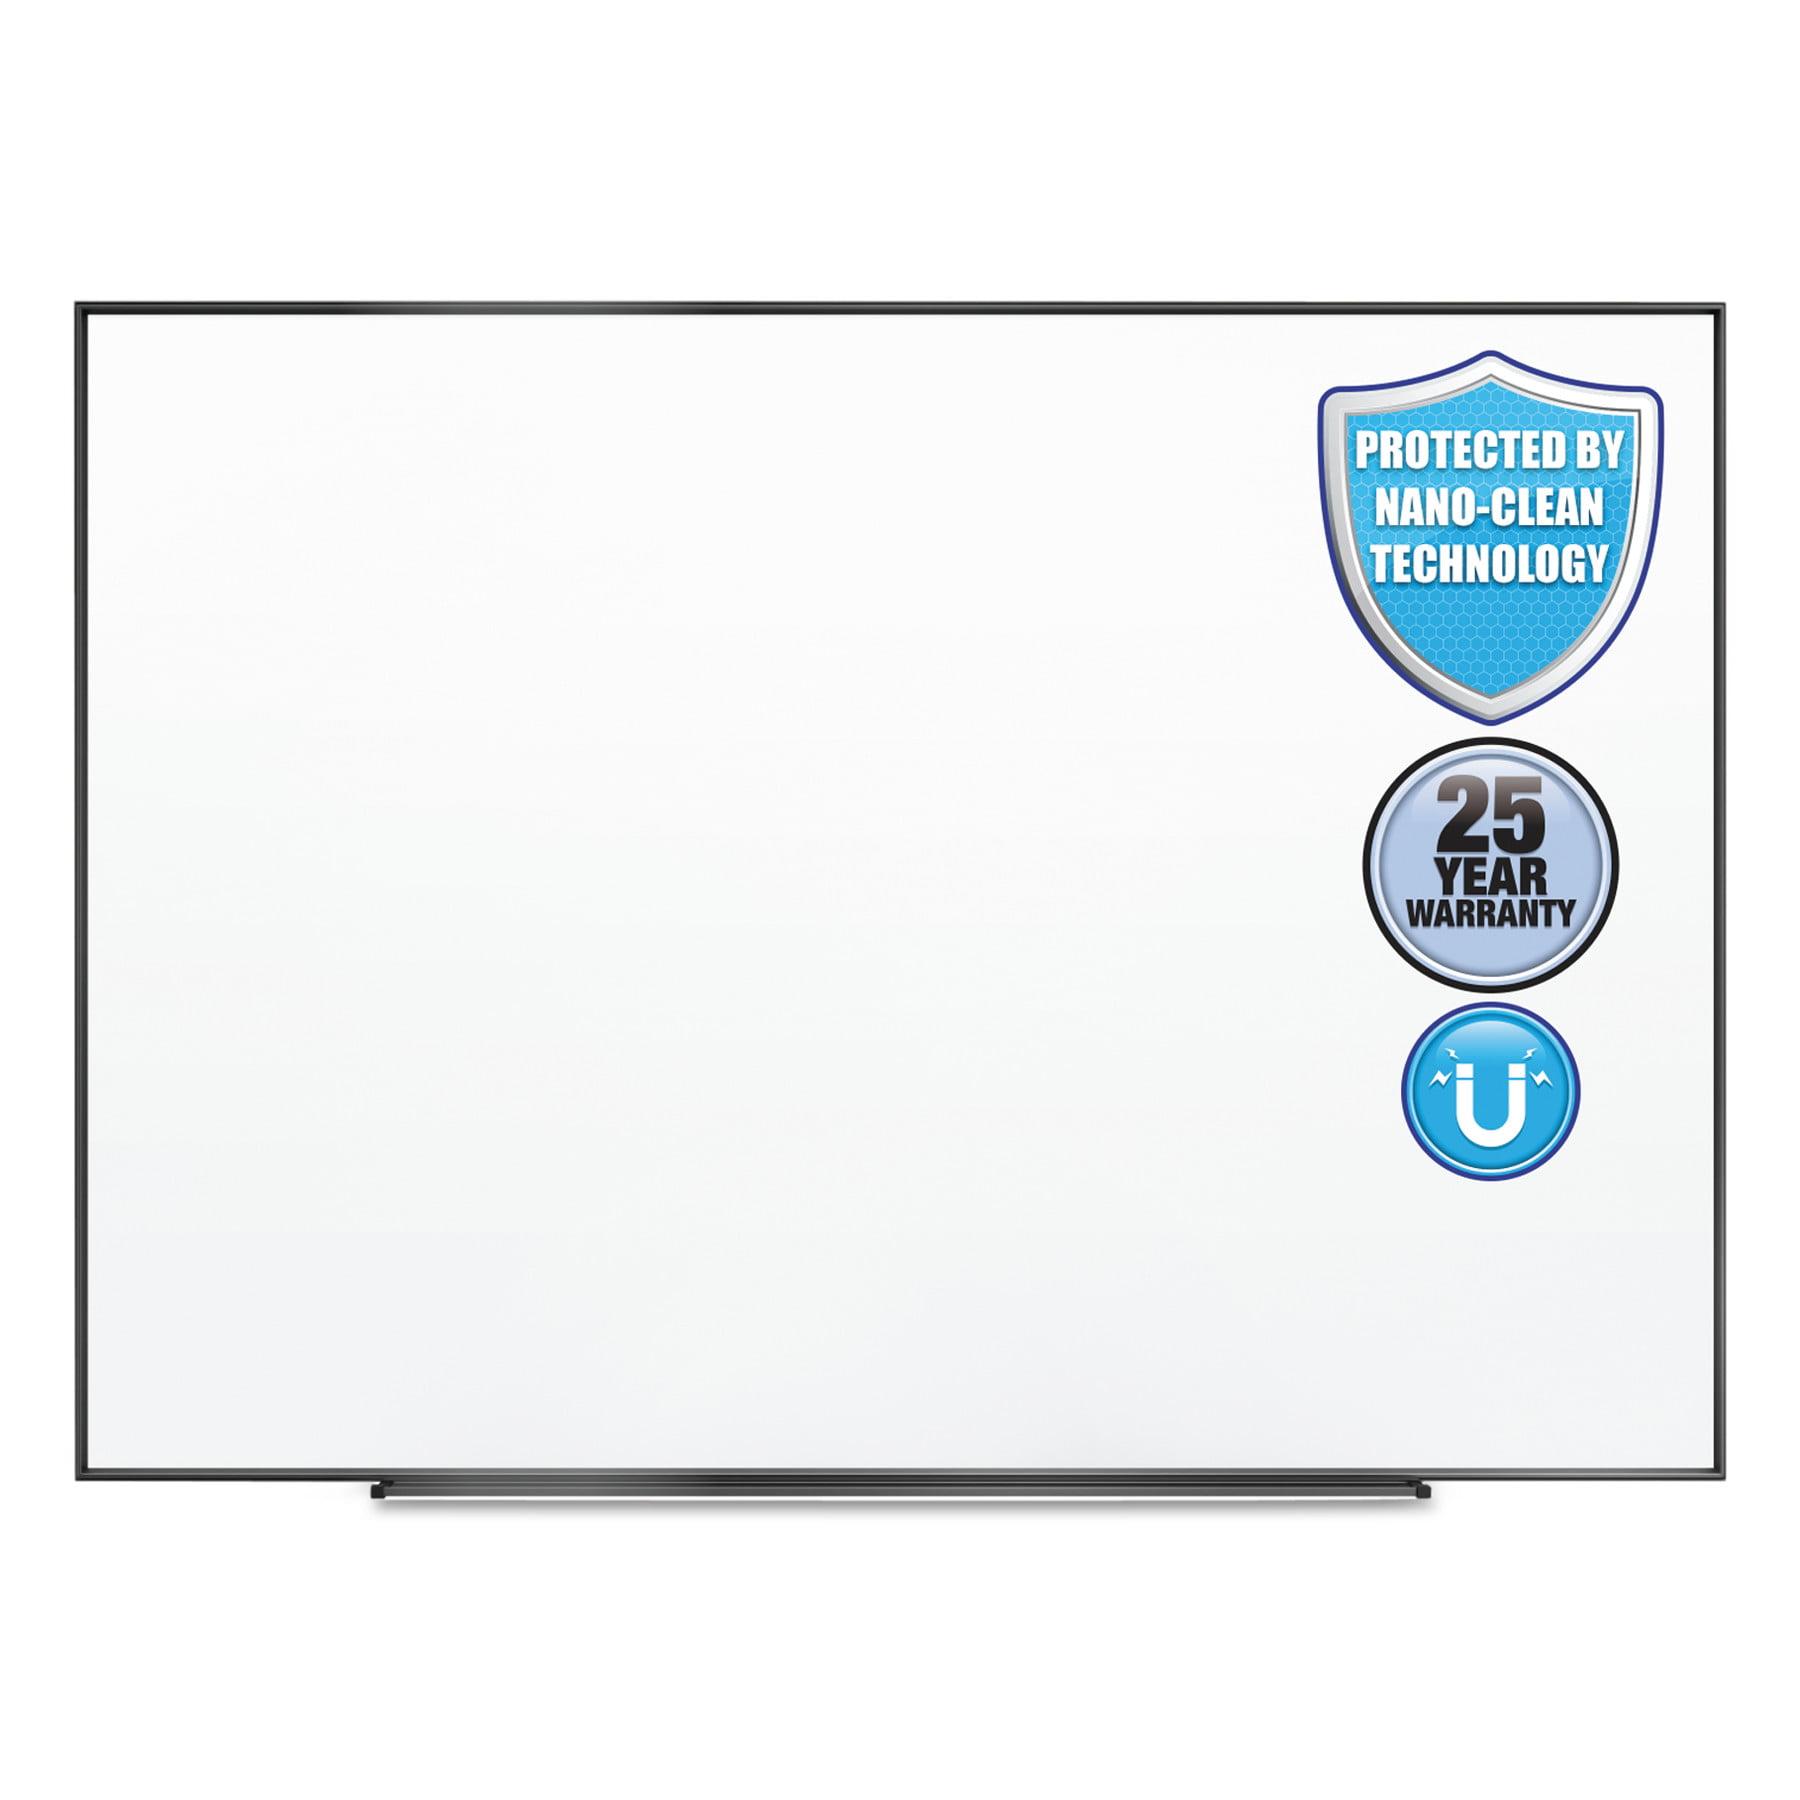 Quartet Fusion Nano-Clean Magnetic Whiteboard, 96 x 48, Black Frame by QUARTET MFG.